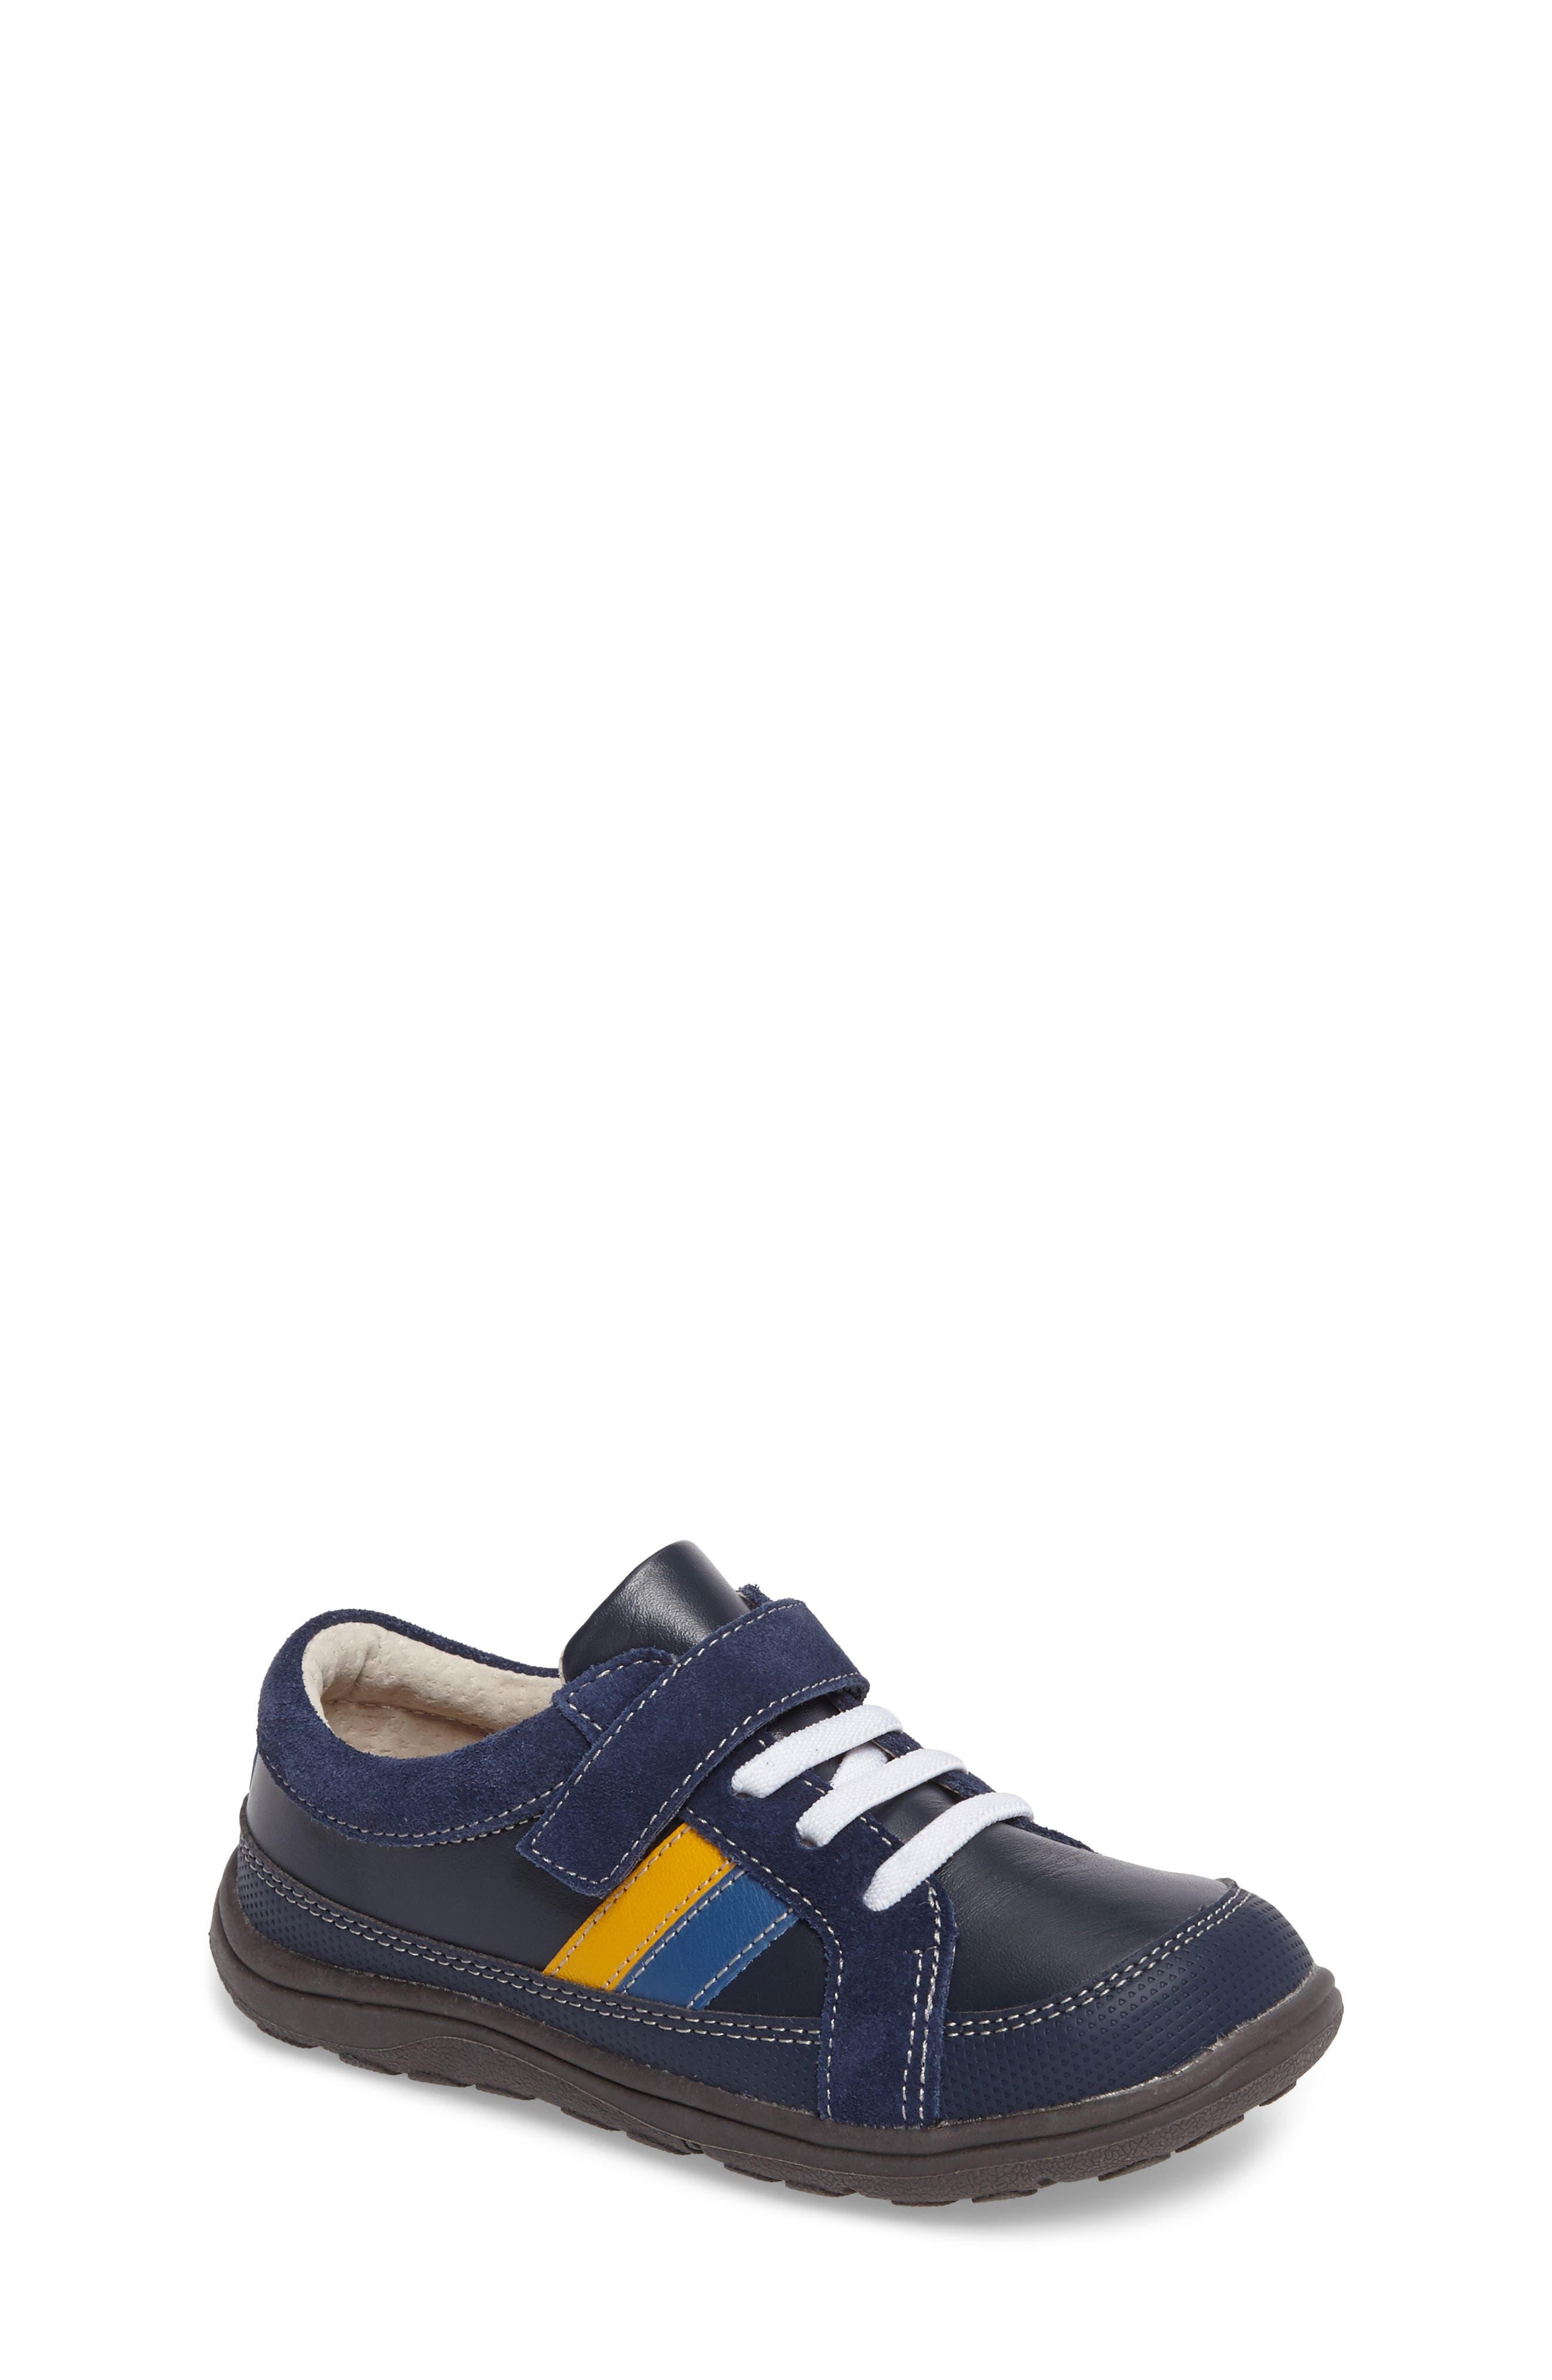 'Randall' Sneaker,                             Main thumbnail 1, color,                             411